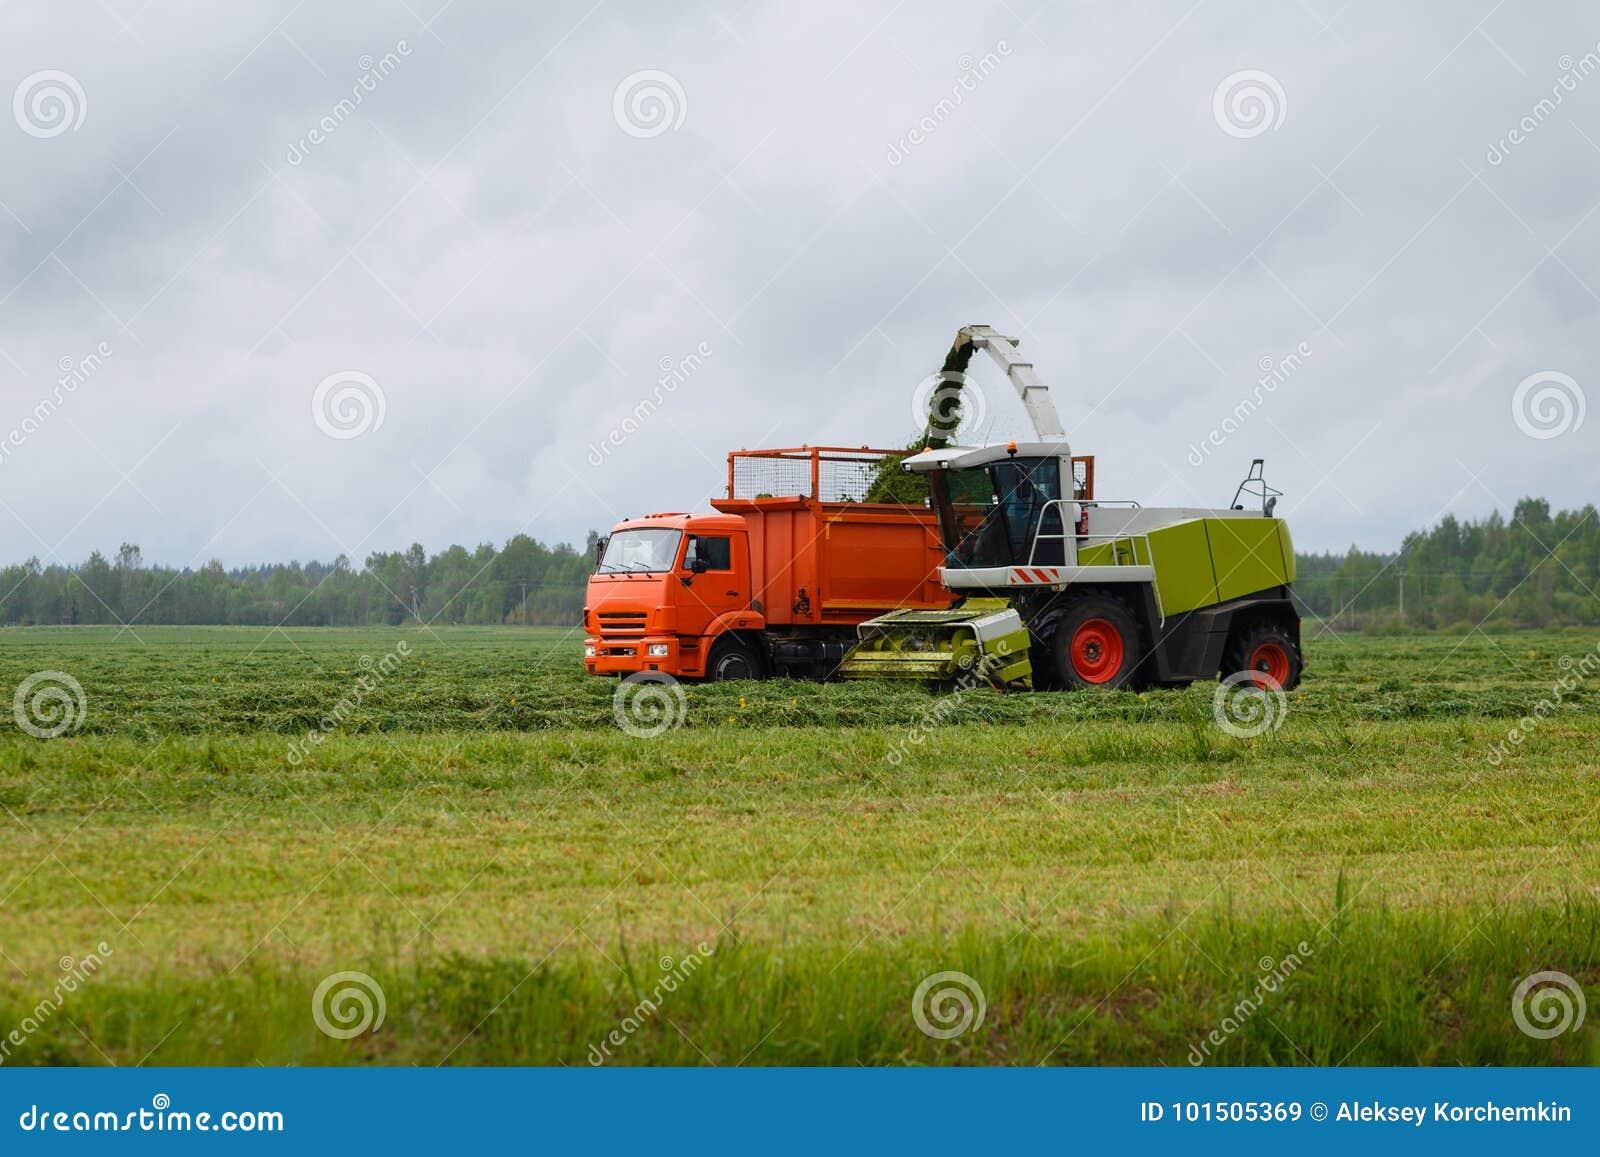 De maaimachine verzamelt droog gras